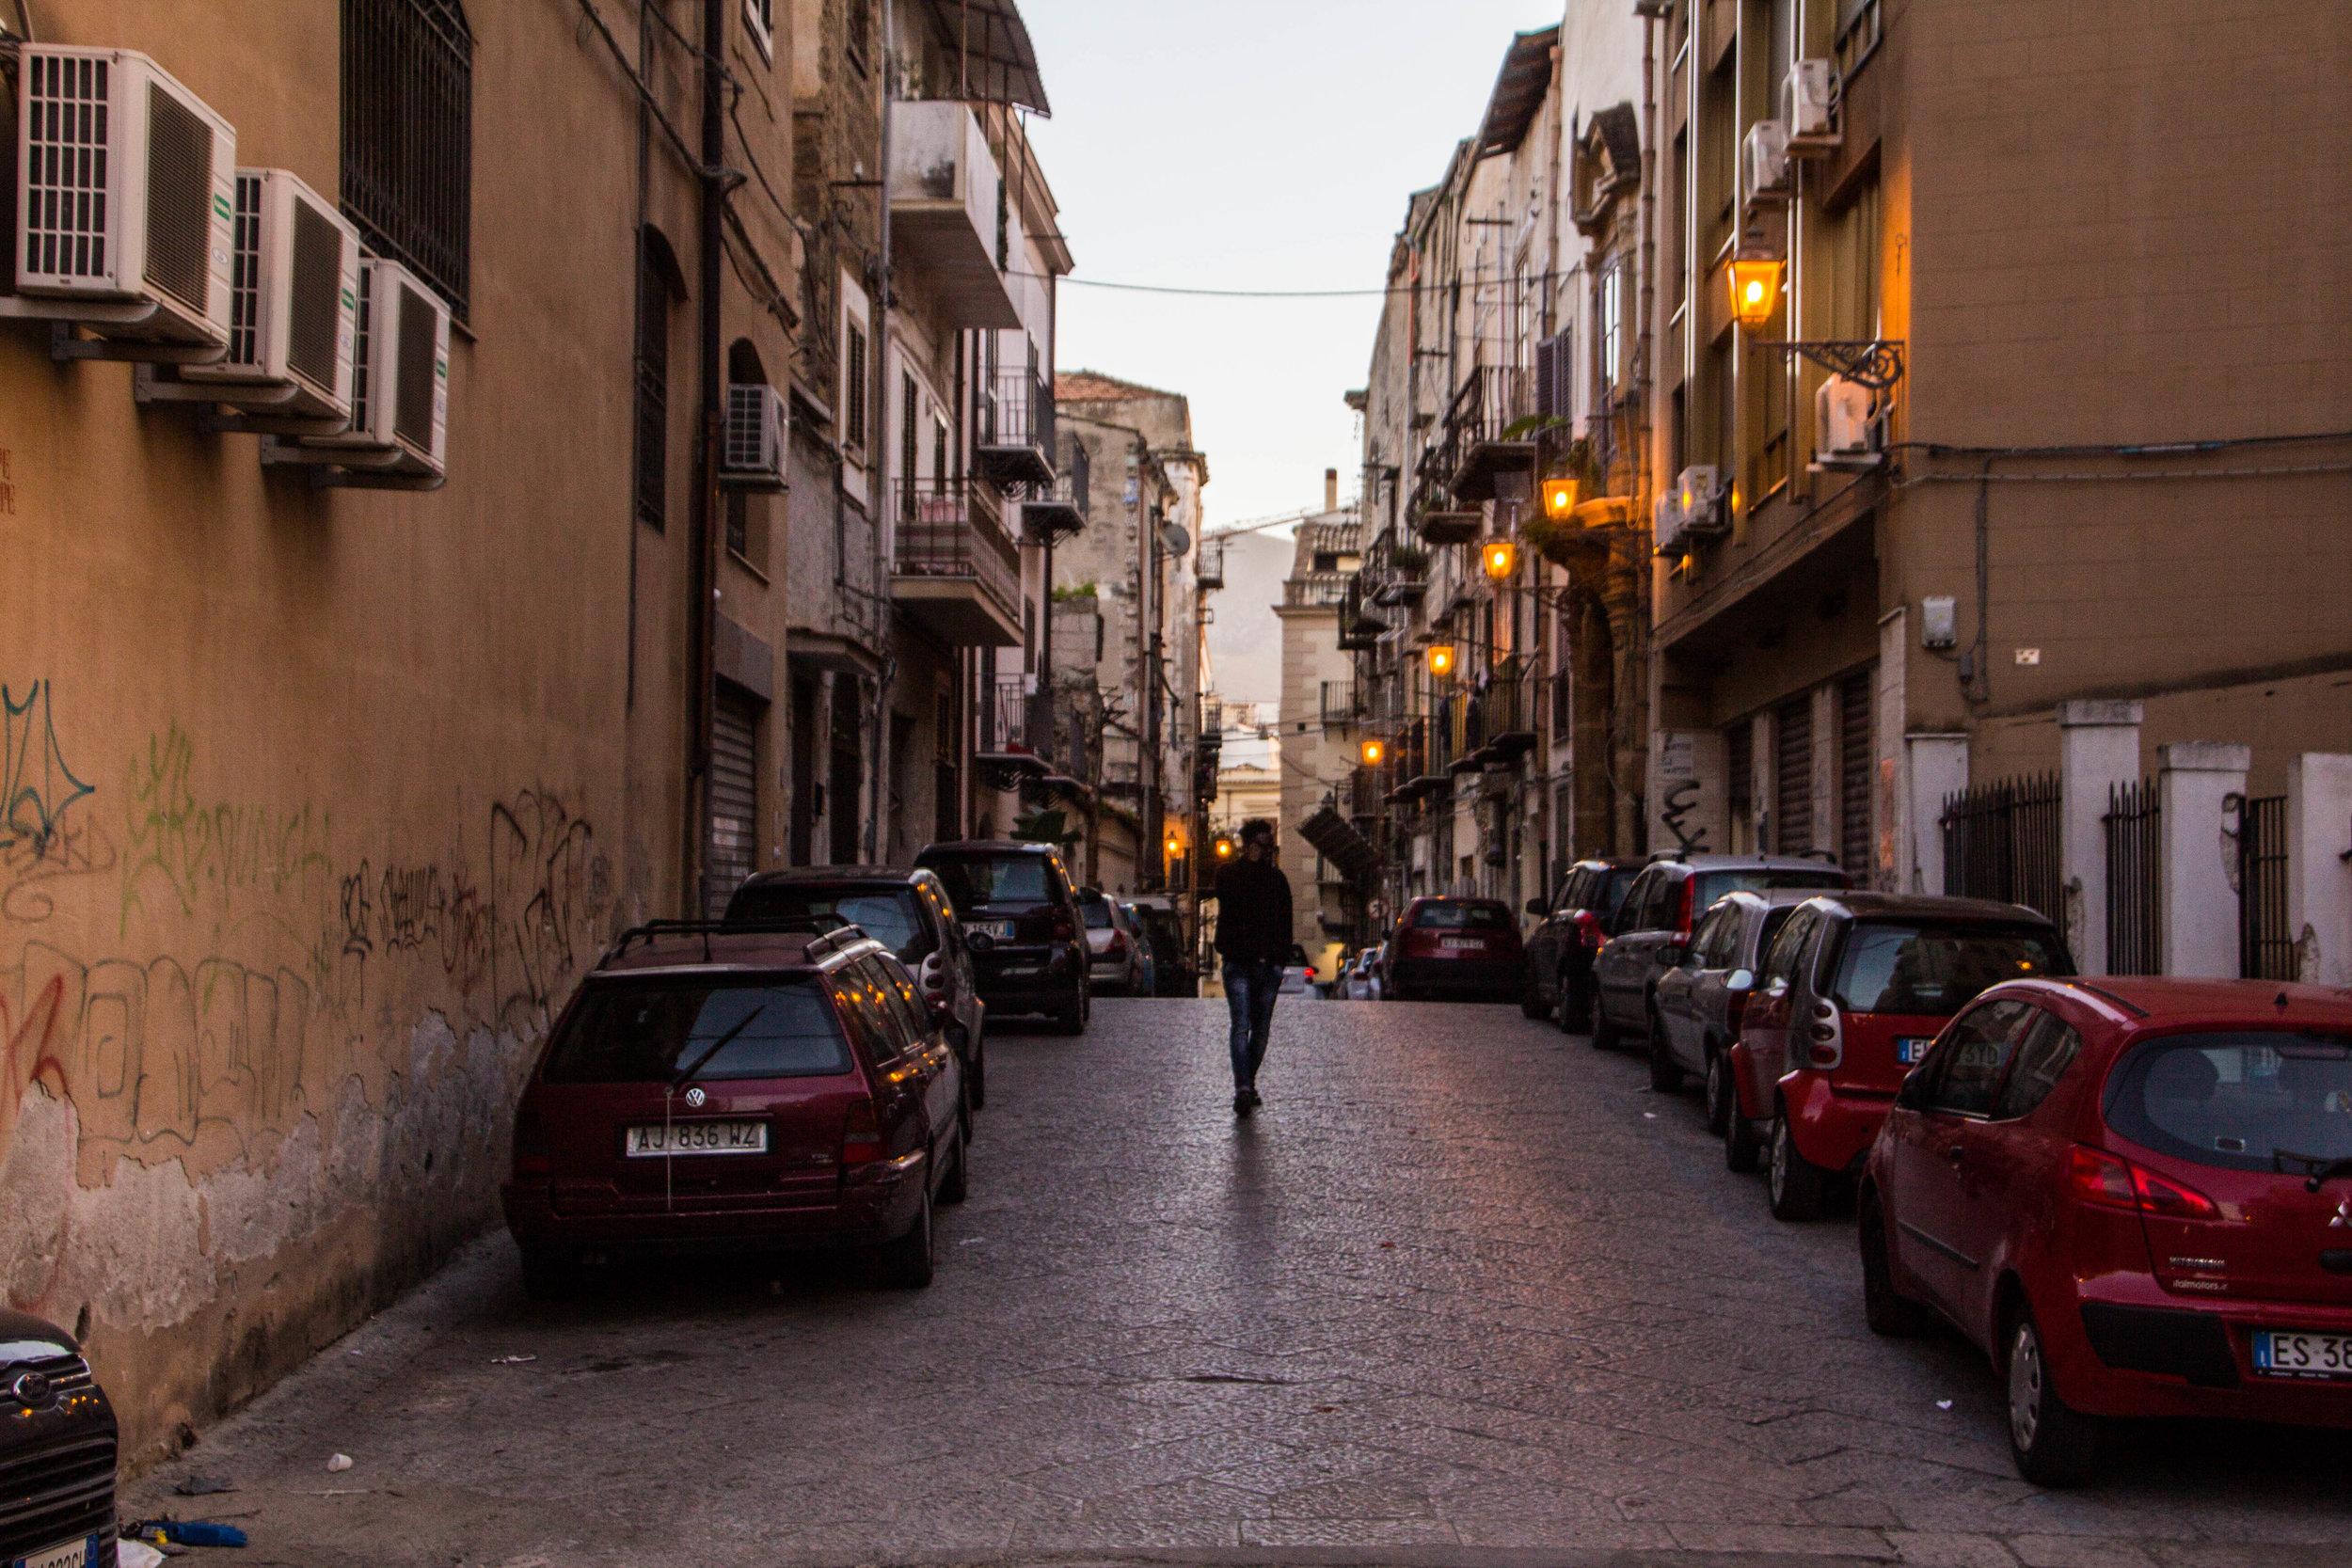 streets-palermo-sicily-24.jpg